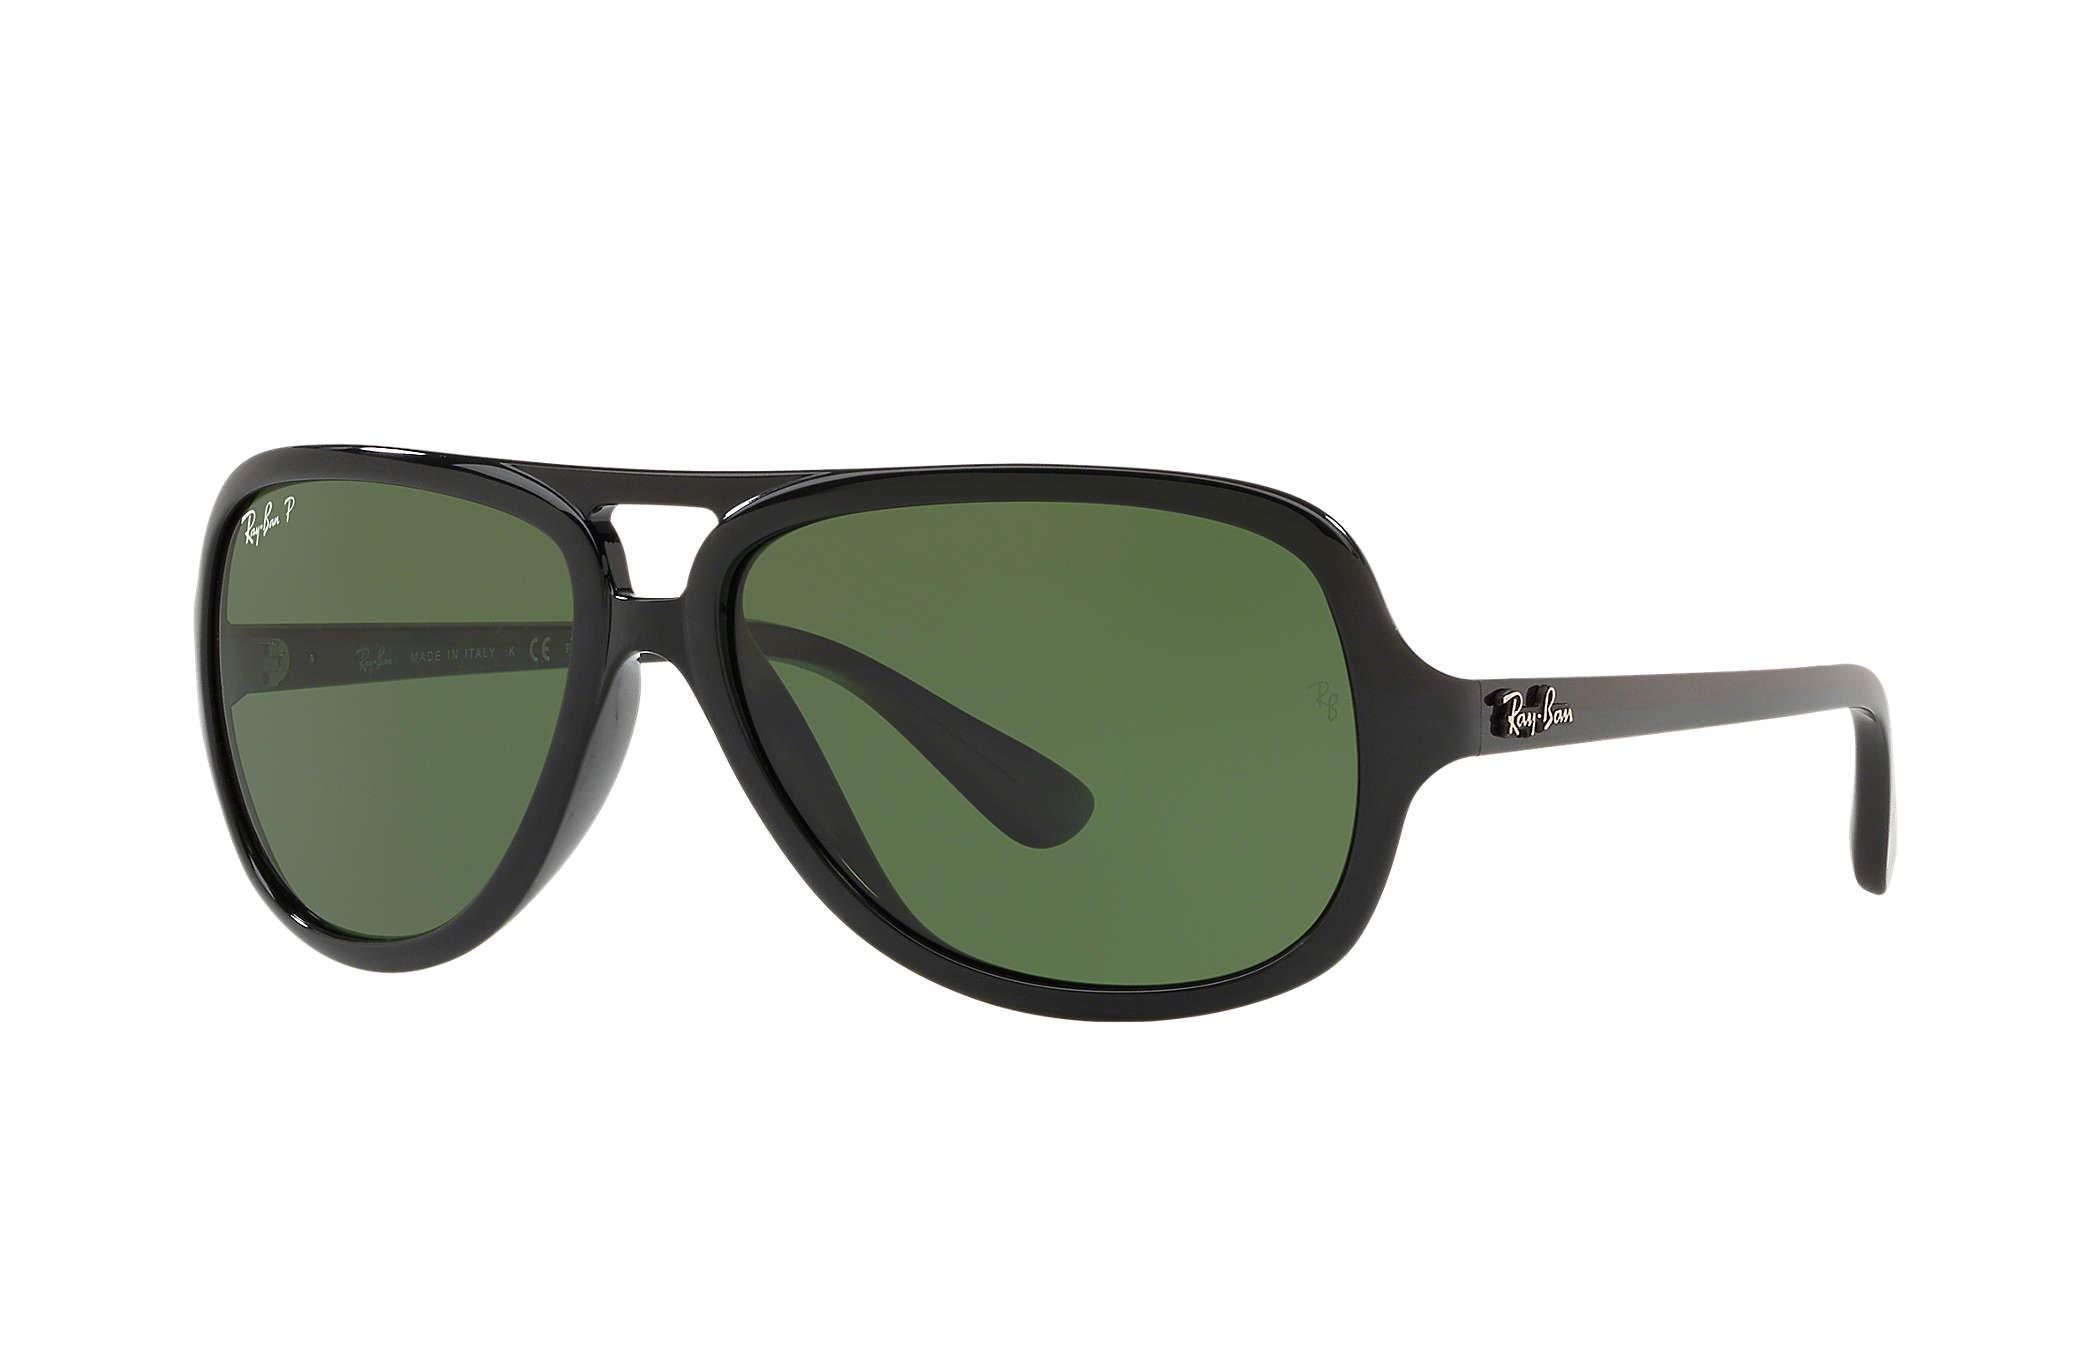 RAY-BAN RB4162 Aviator Sunglasses, Black/Polarized Green, 59 mm by RAY-BAN